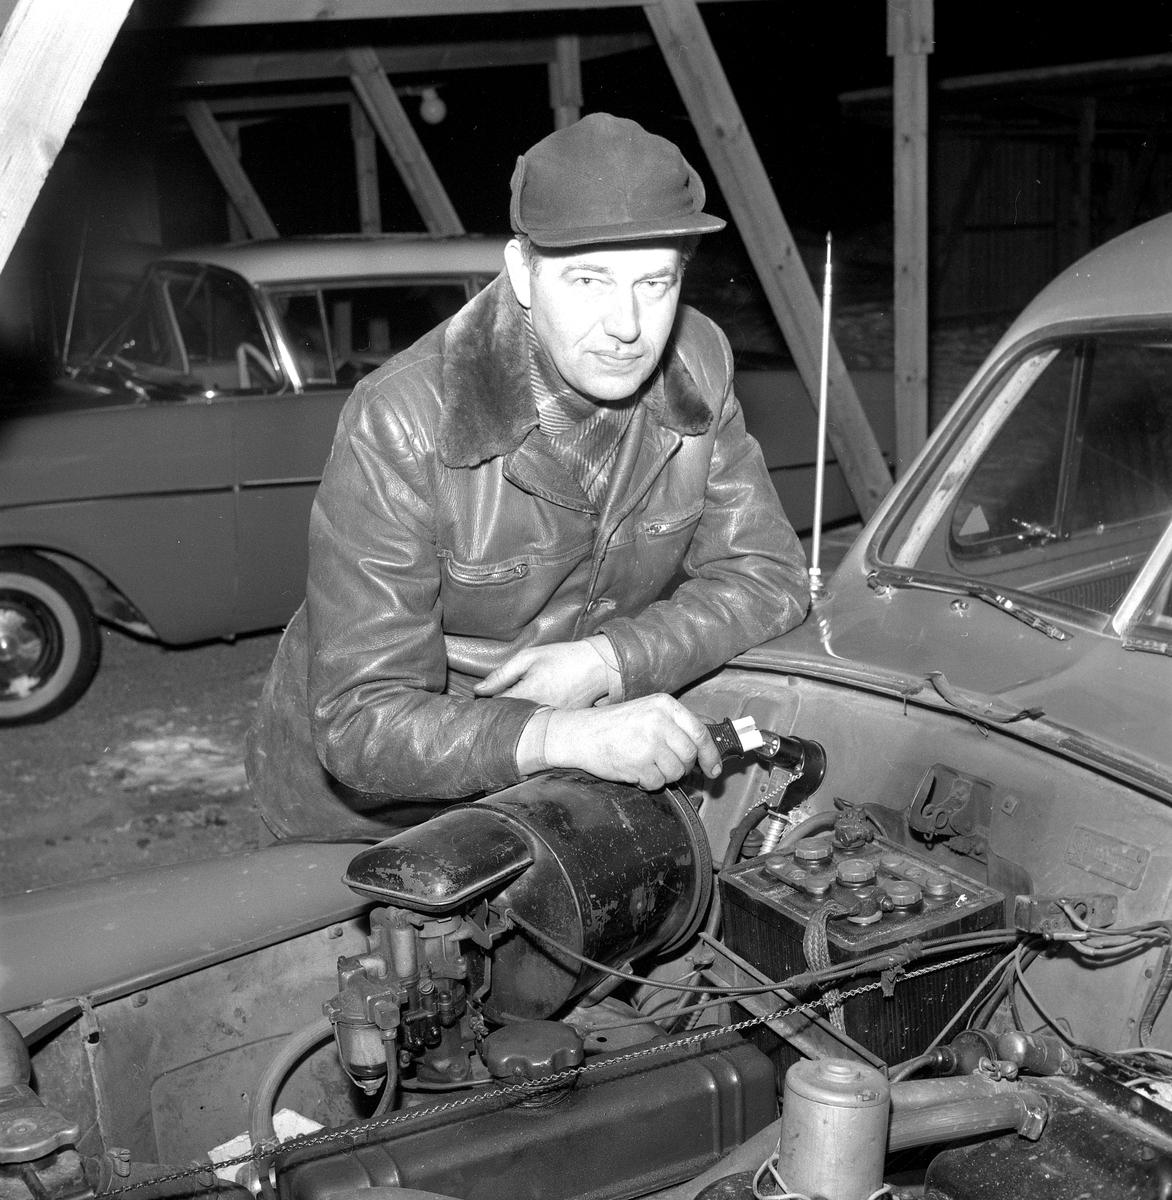 Garage i Rosta. 15 januari 1959.